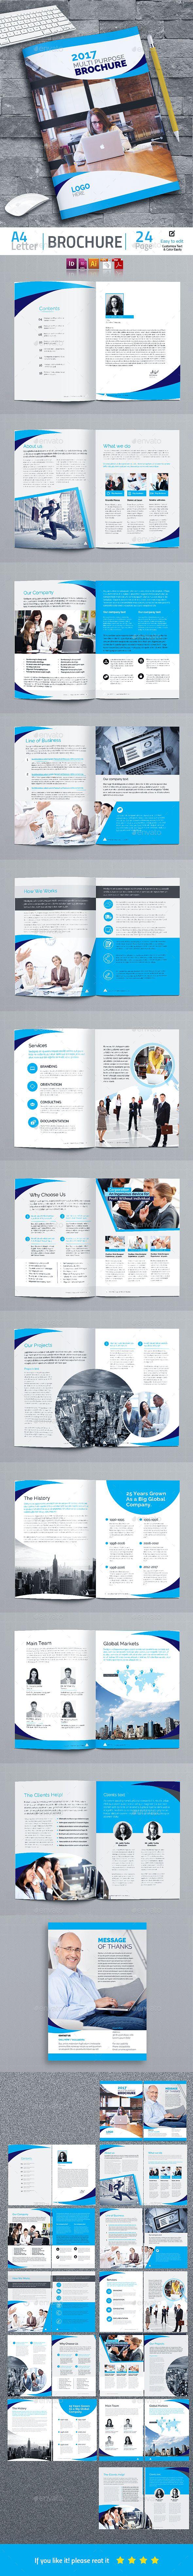 Brochure Template Vector EPS, InDesign INDD, AI Illustrator ...